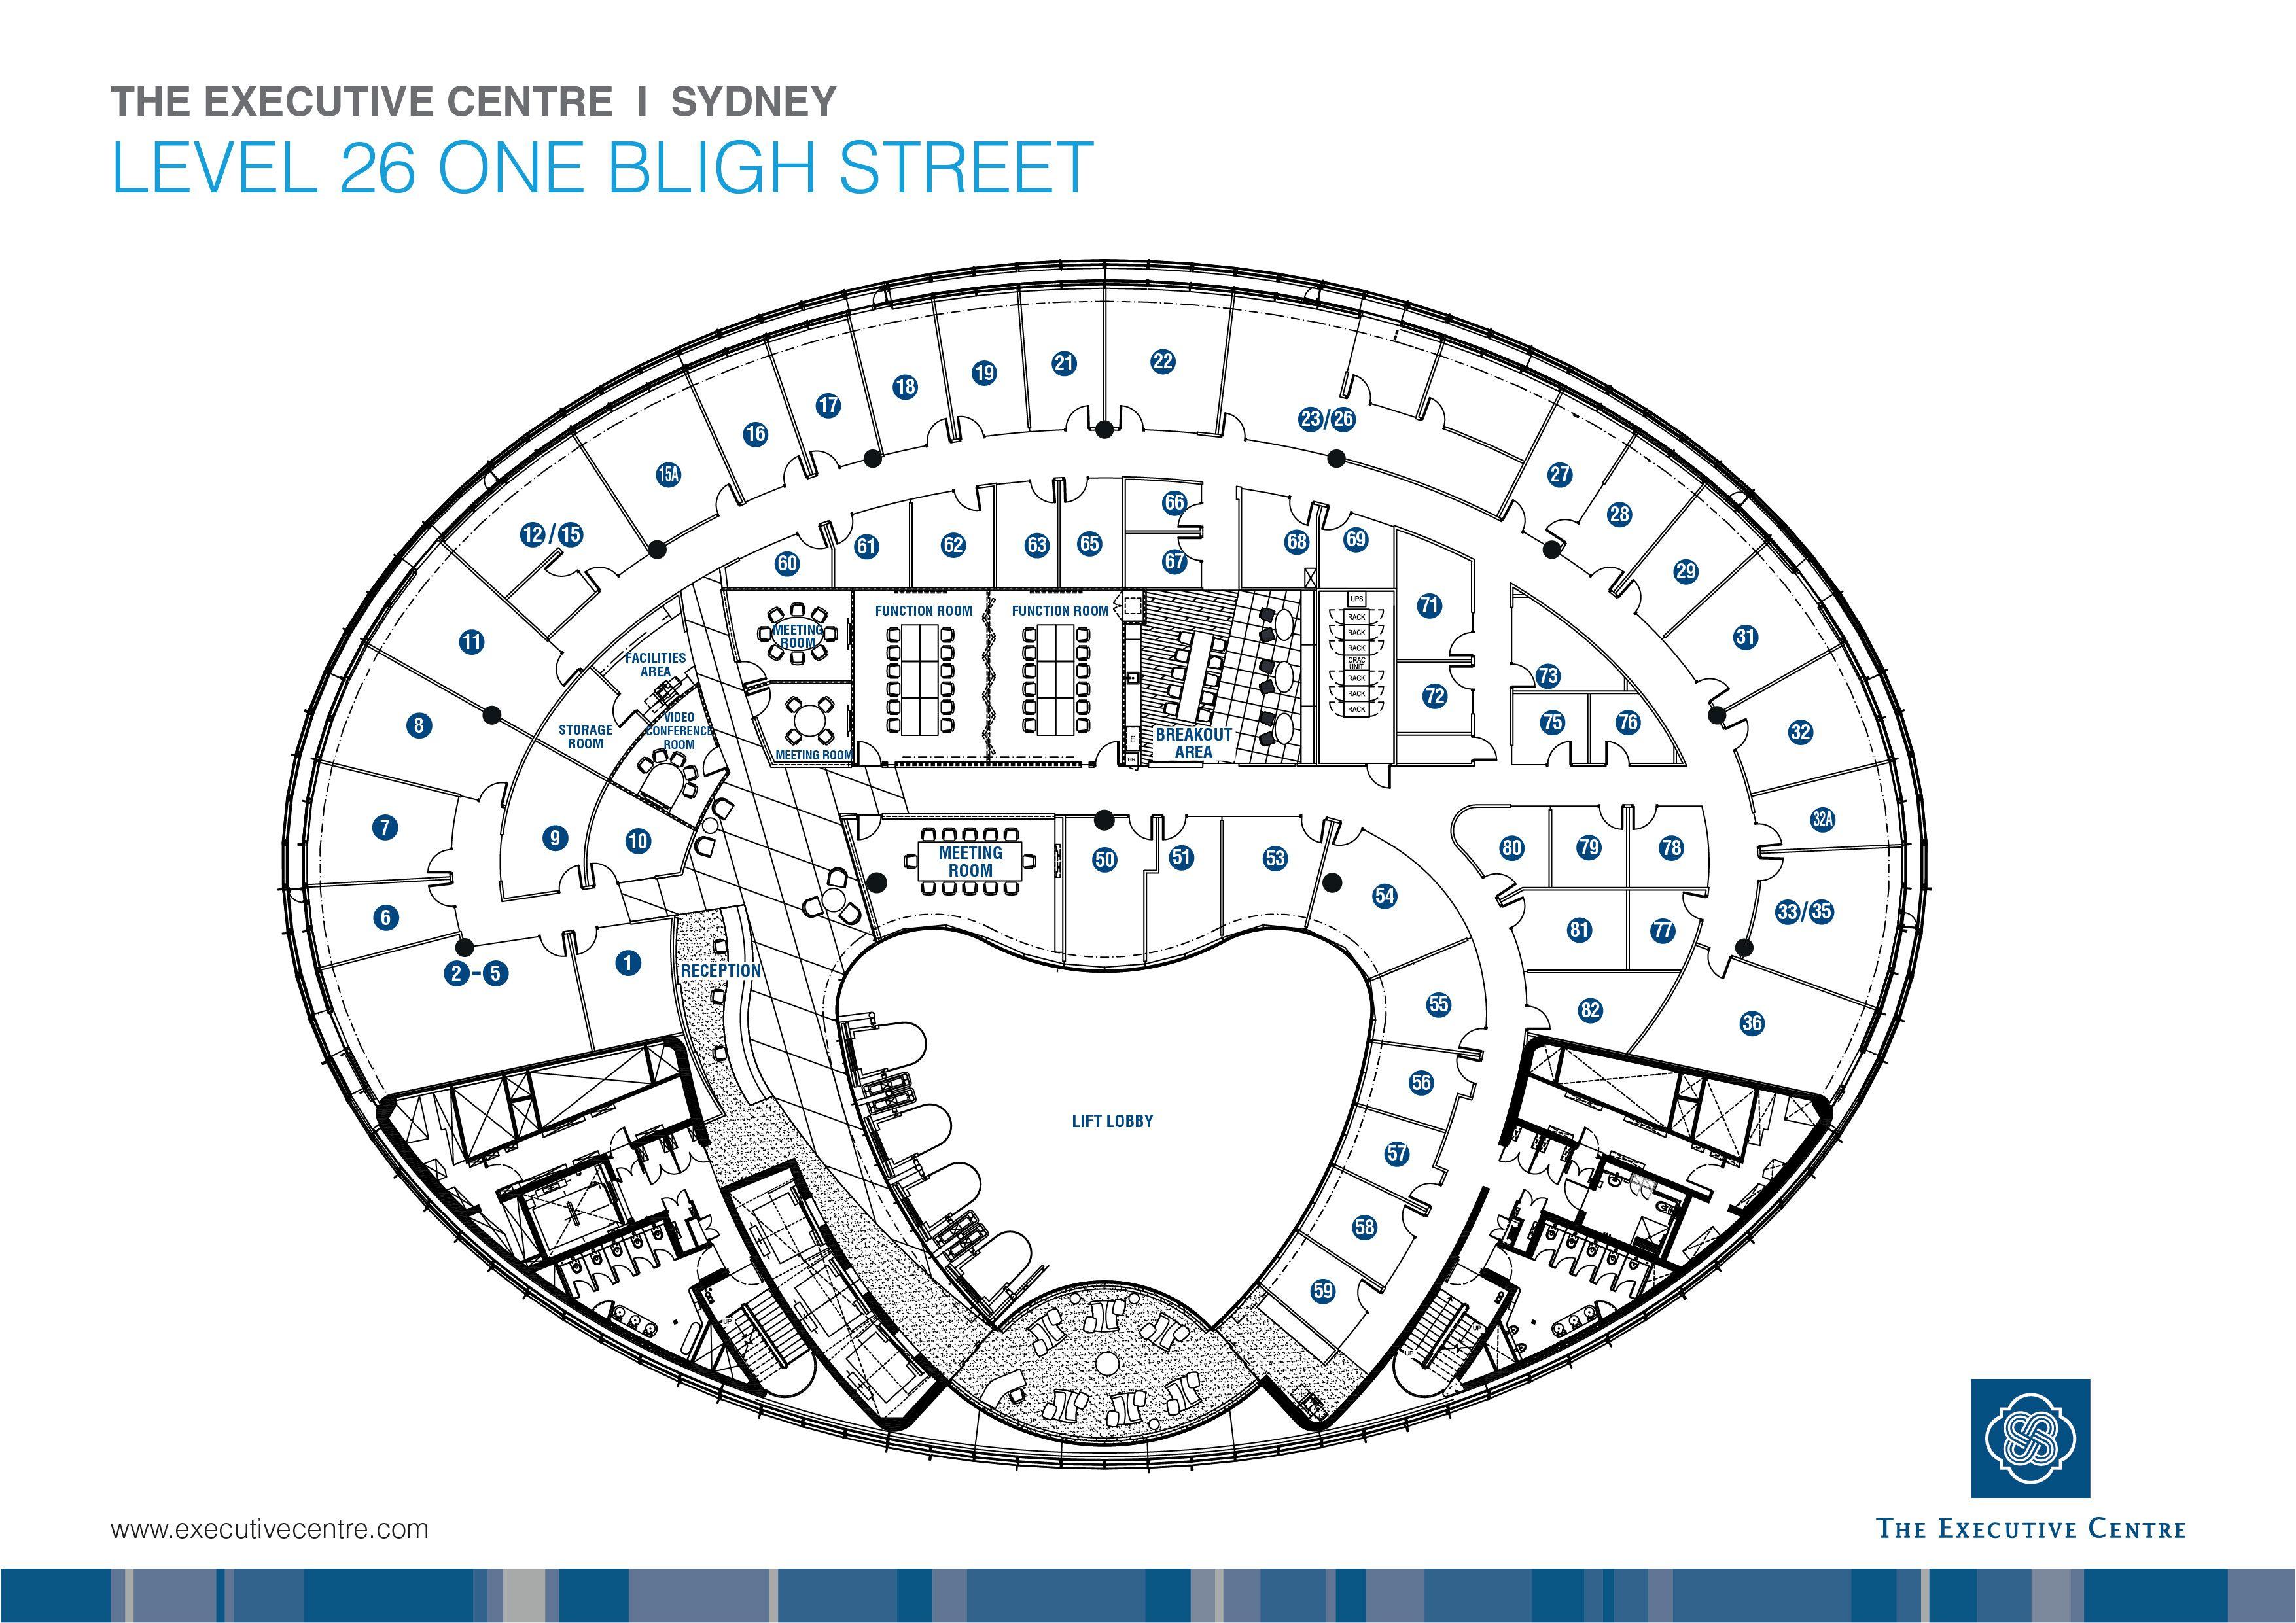 Fp Syd 1 Bligh St Jpg 3509 2481 Office Floor Plan Office Tower How To Plan